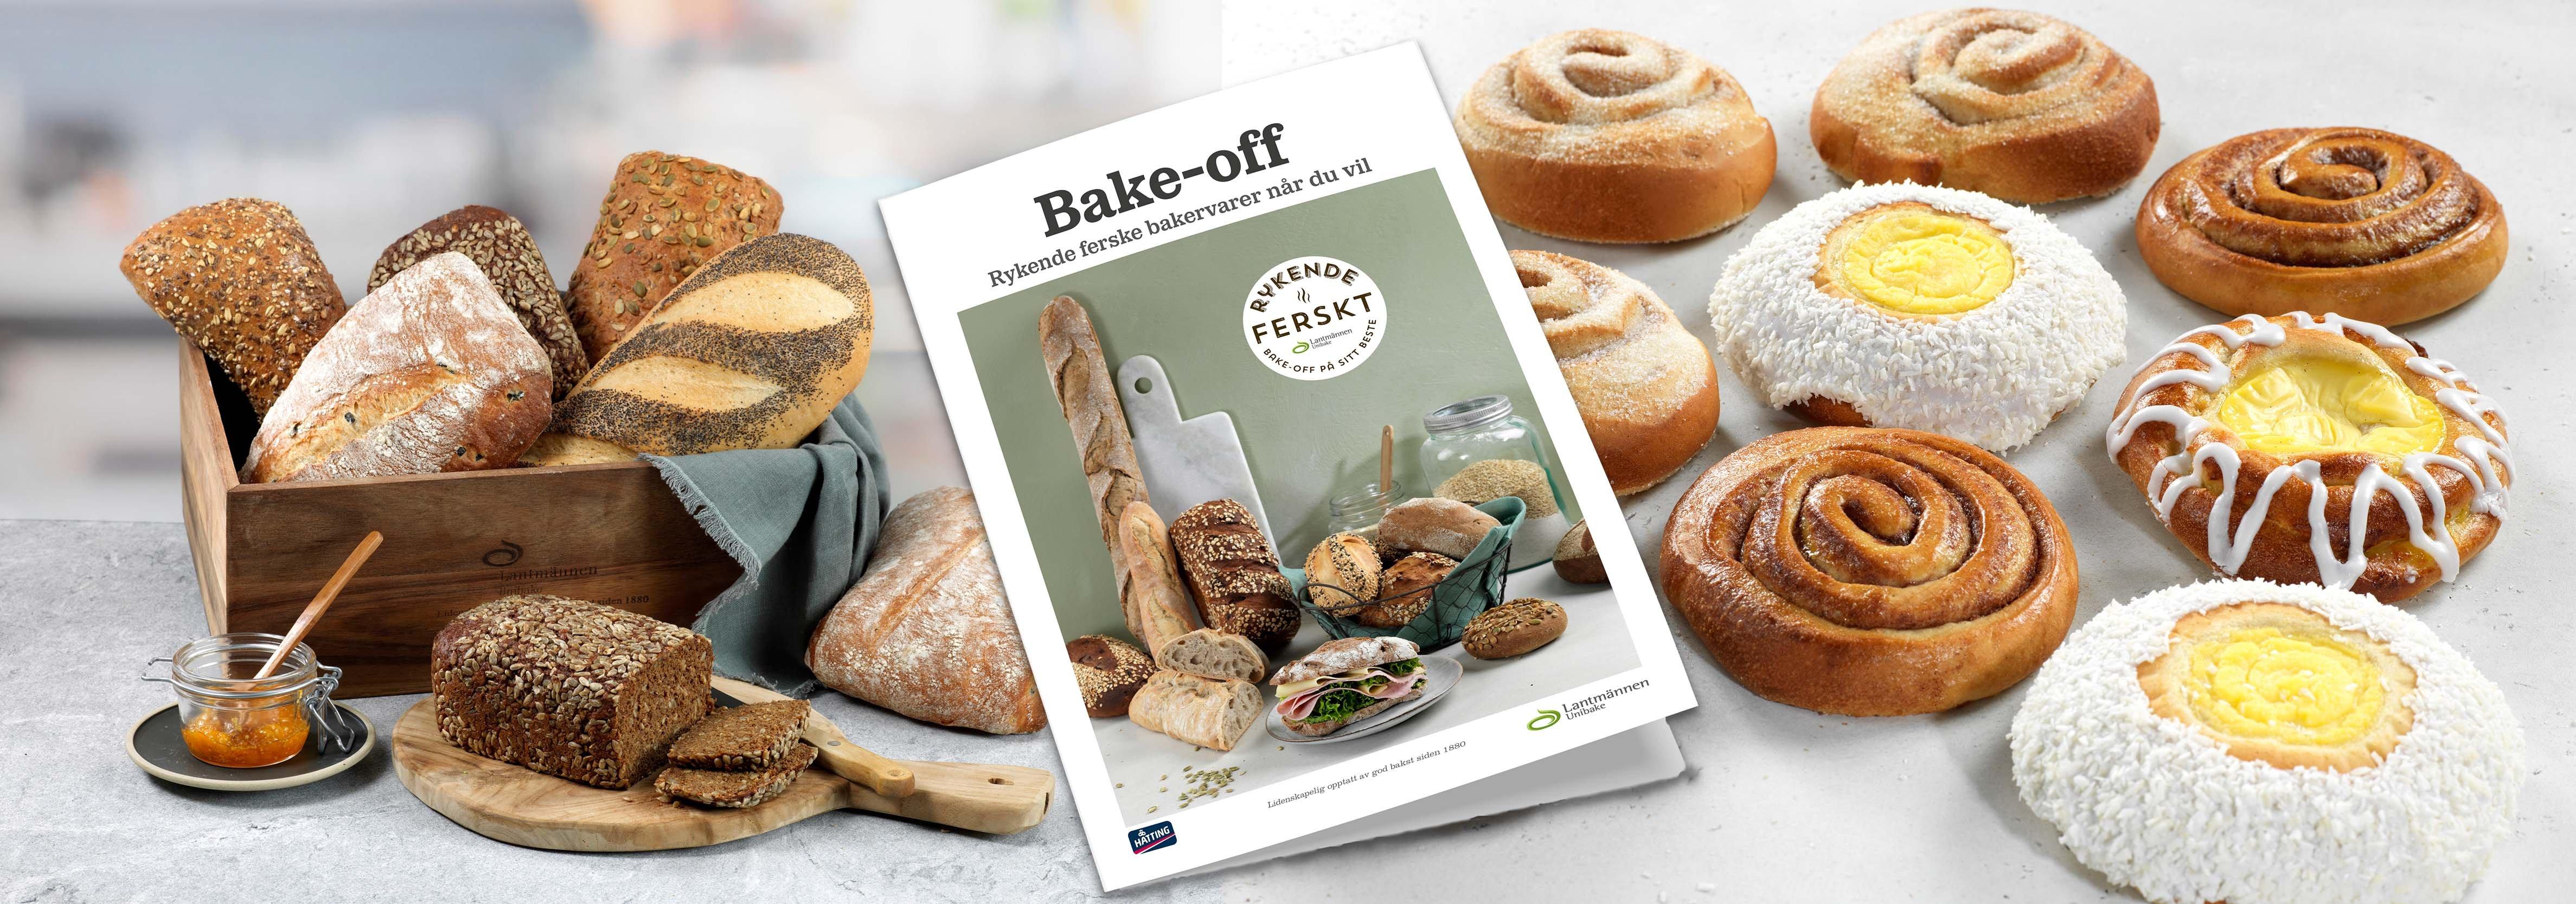 Bake-off rykende ferske bakervarer